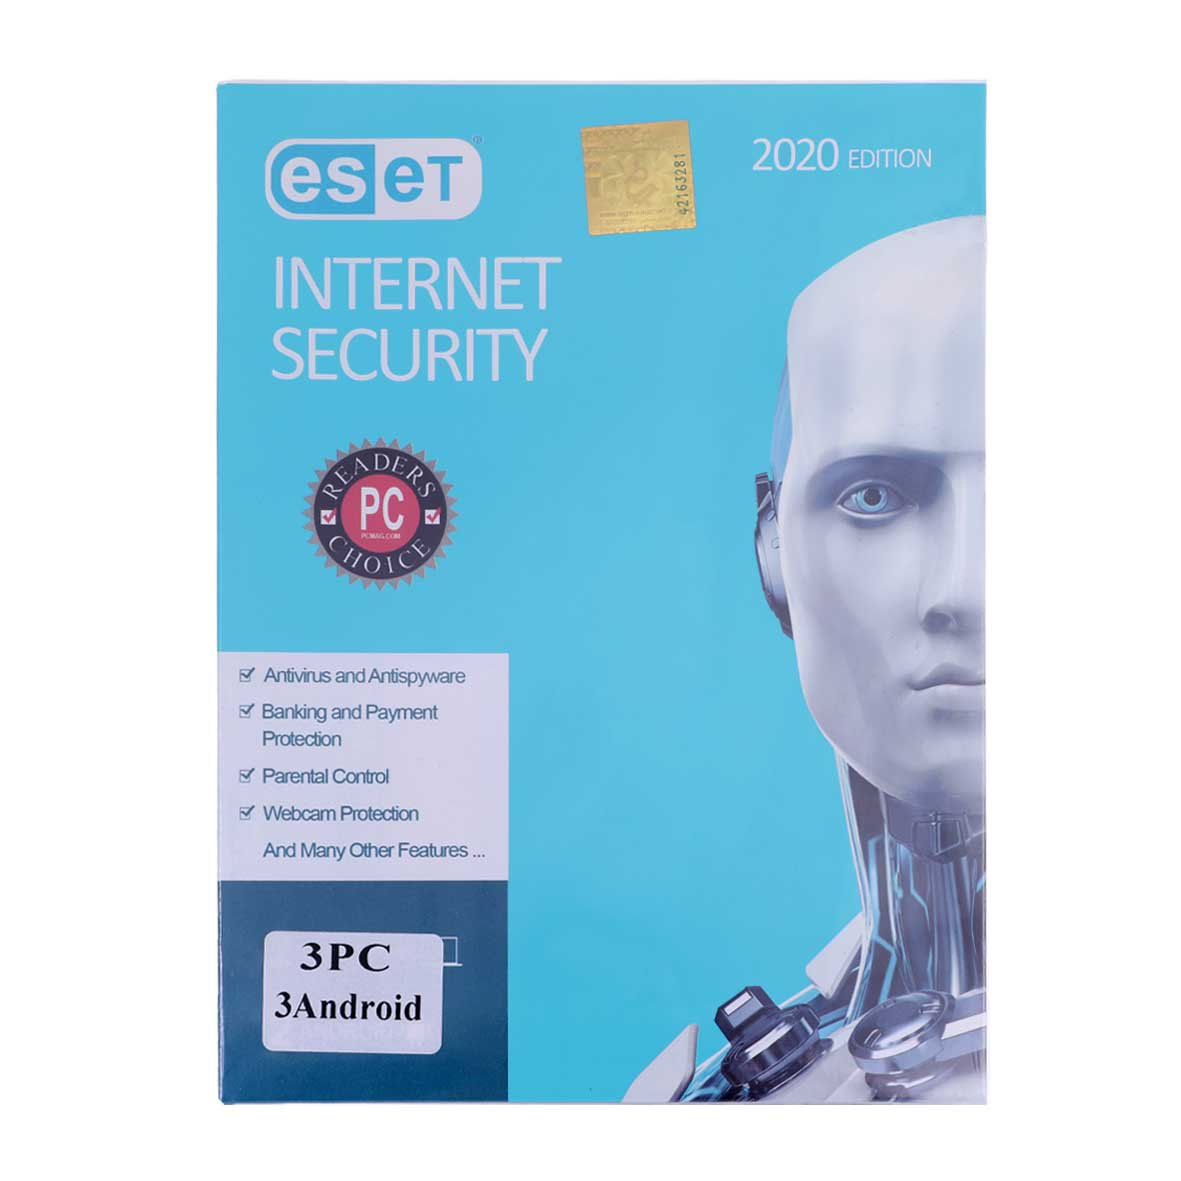 آنتی ویروس ESET INTERNET Security 2020 اورجینال یکساله (PC 3+ Android3)